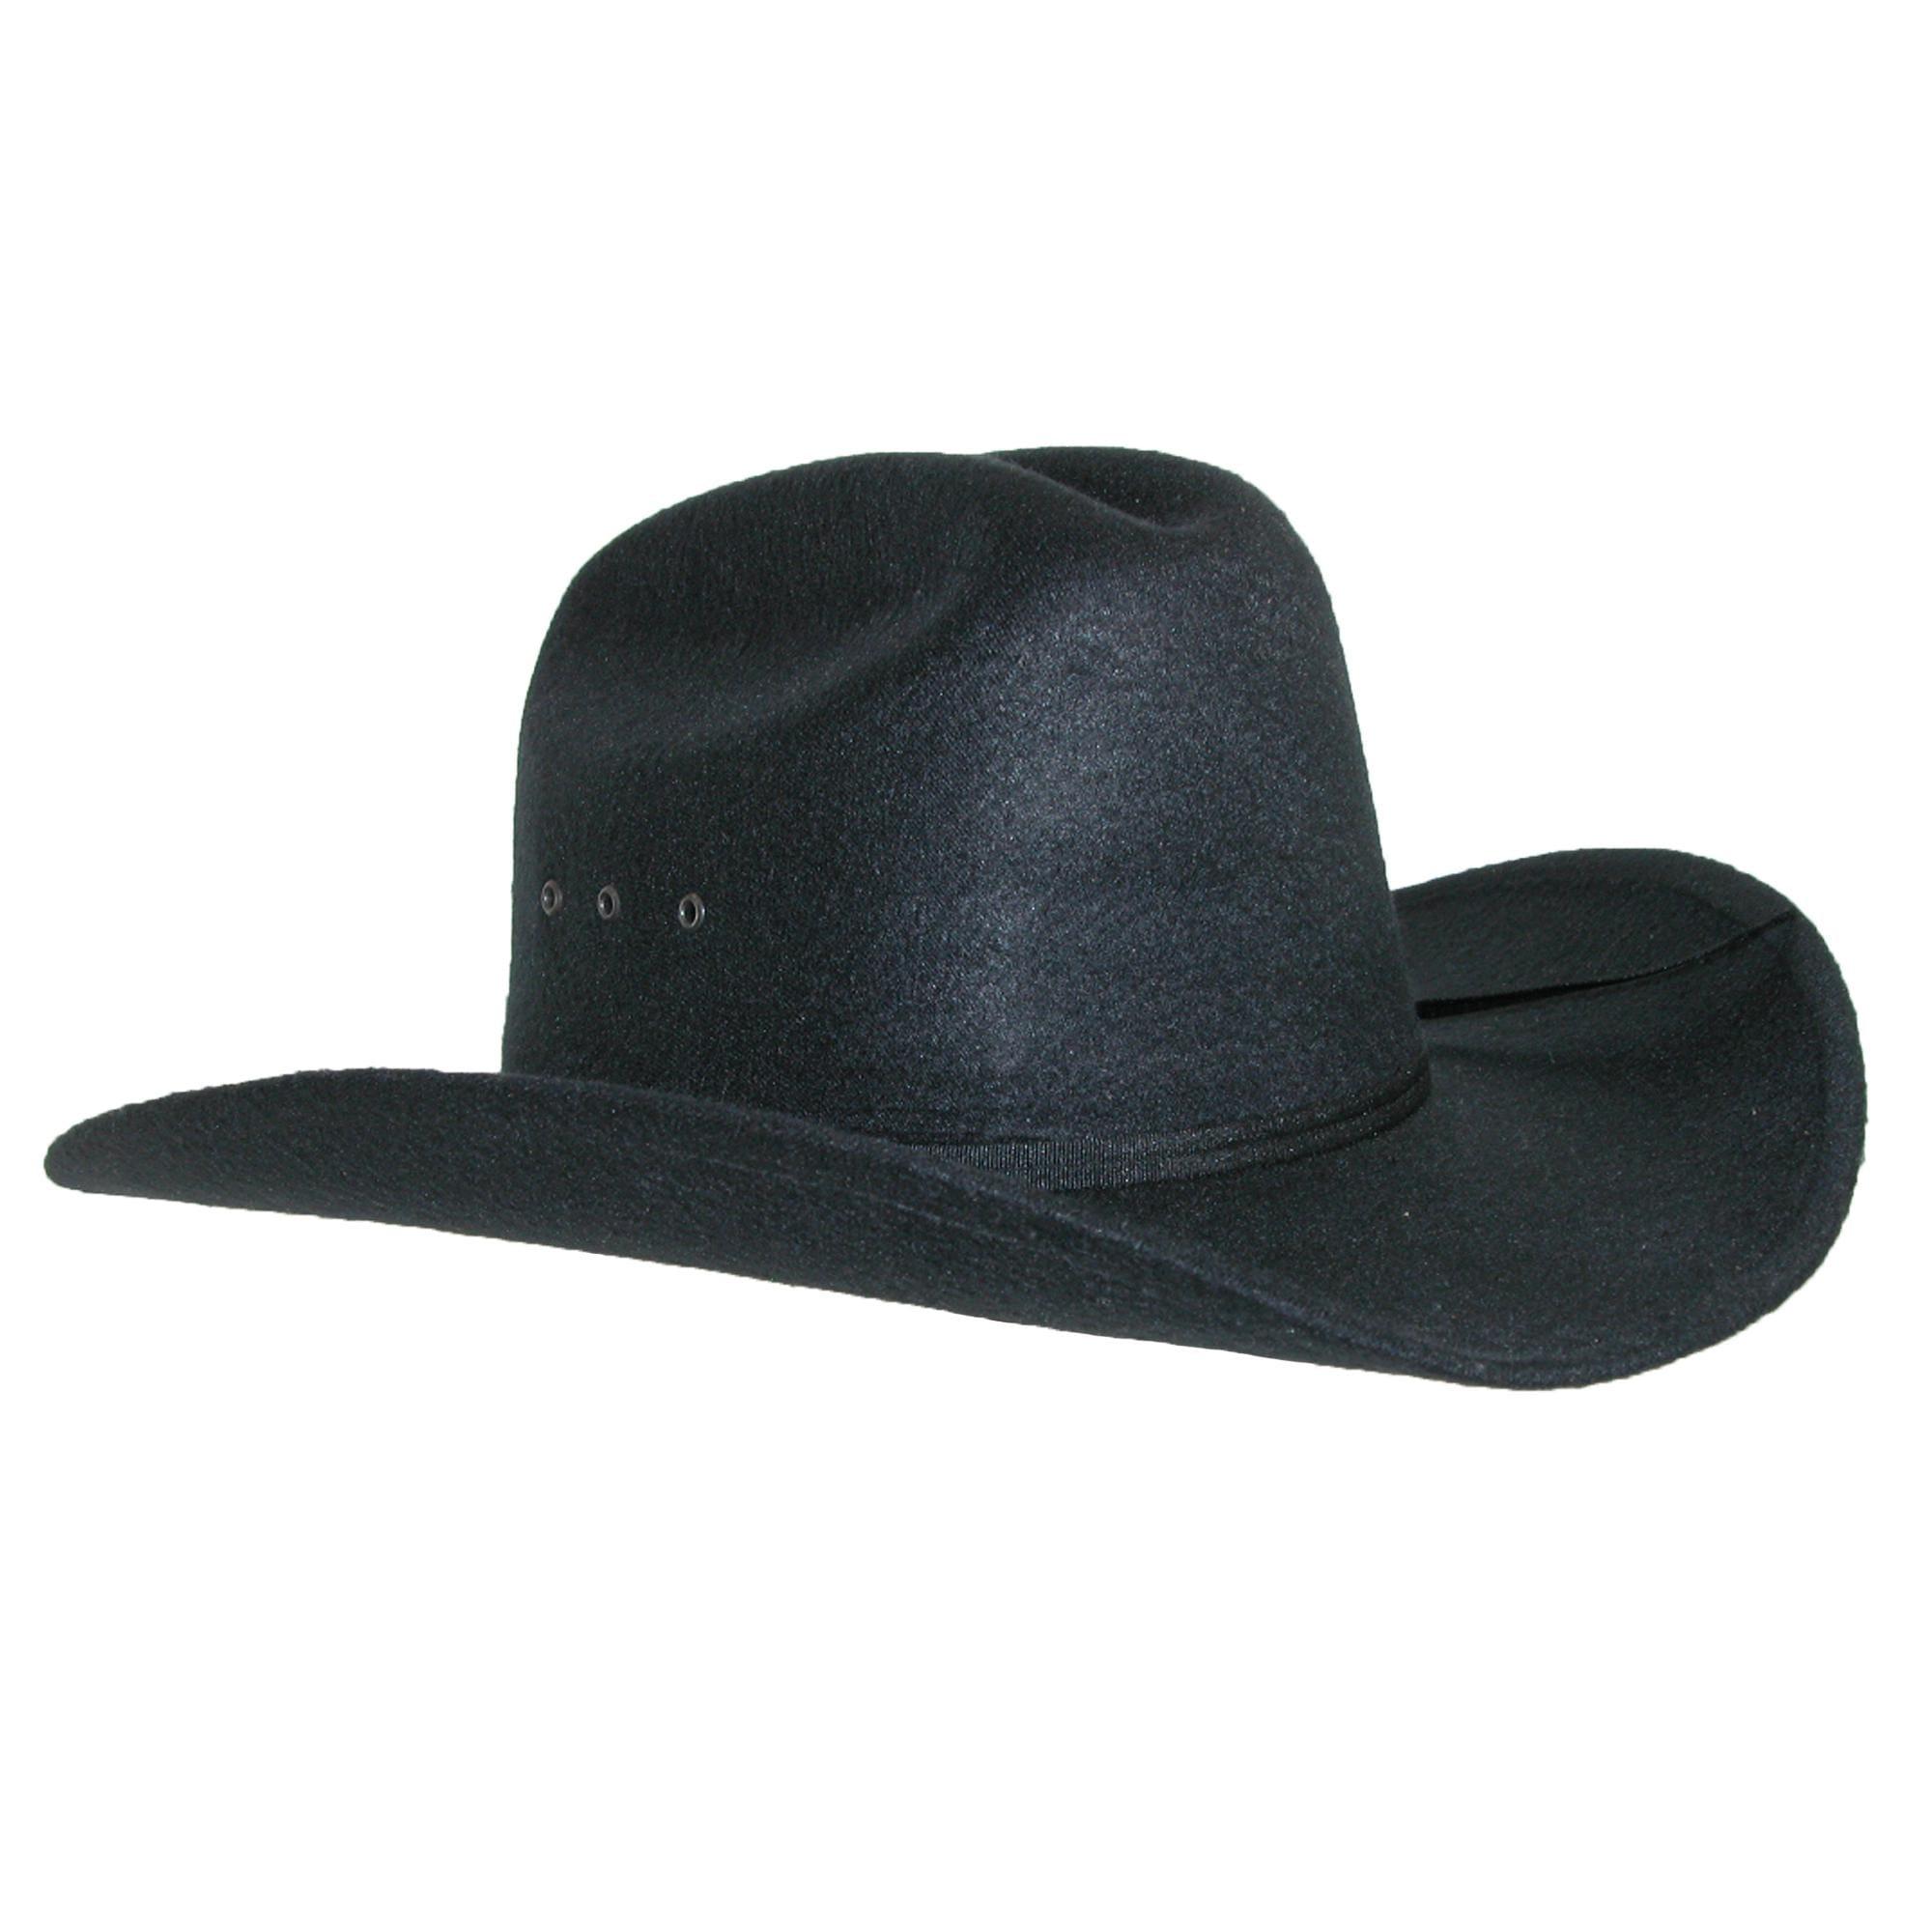 62cafb2e Mens Cattleman Straw Cowboy Hats - Parchment'N'Lead